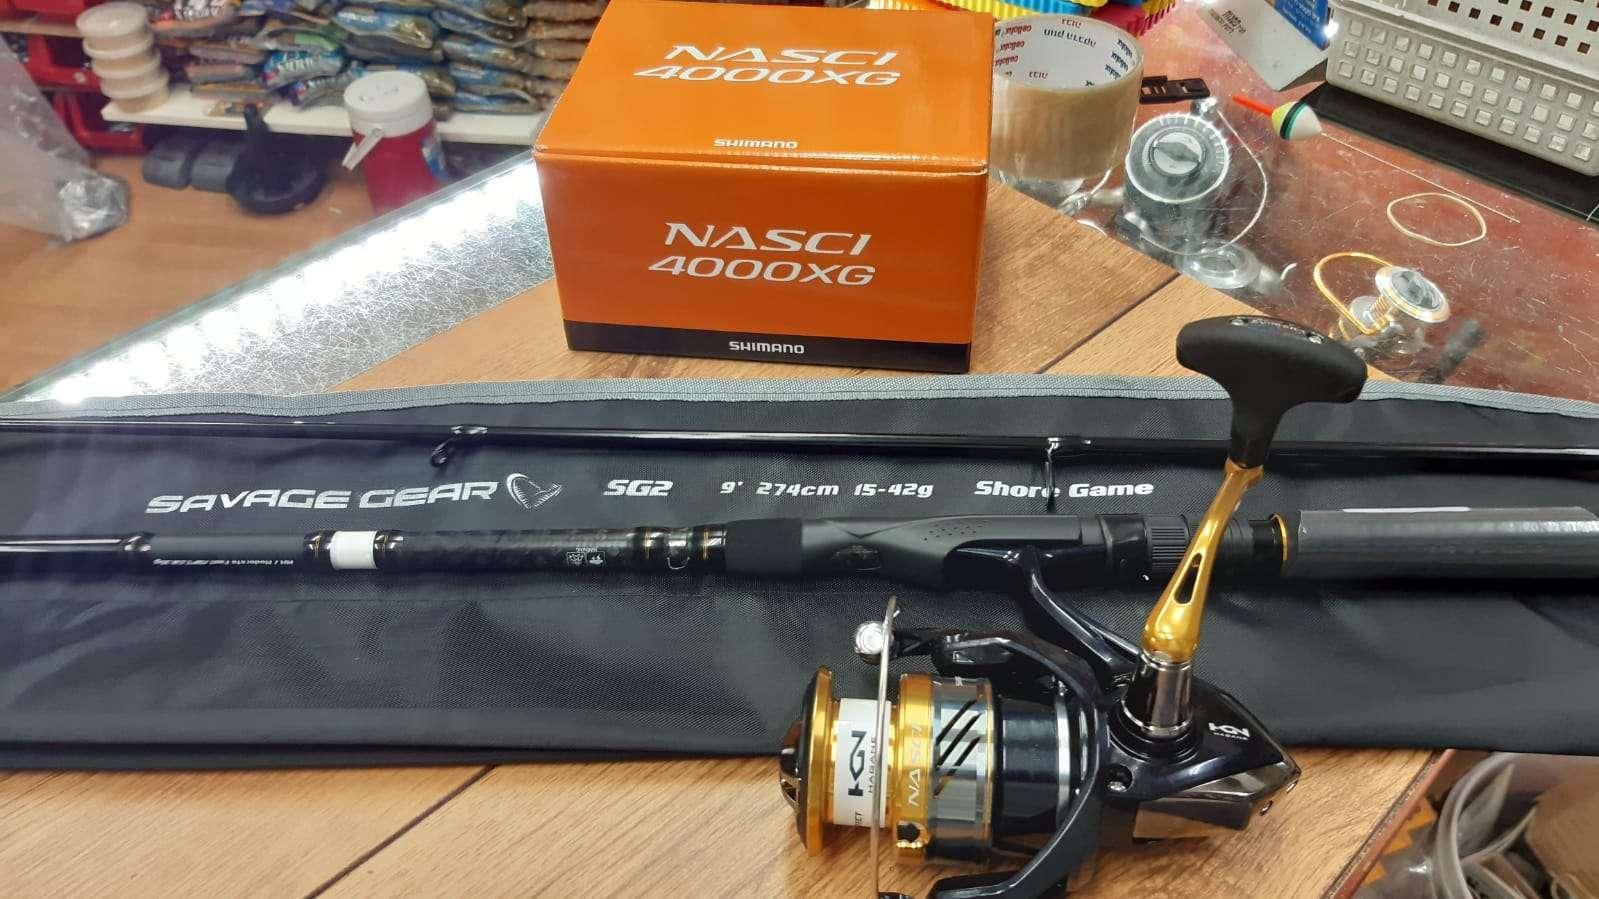 SAVAGE GEAR GS2 15-42 + SHIMANO NASCI 4000